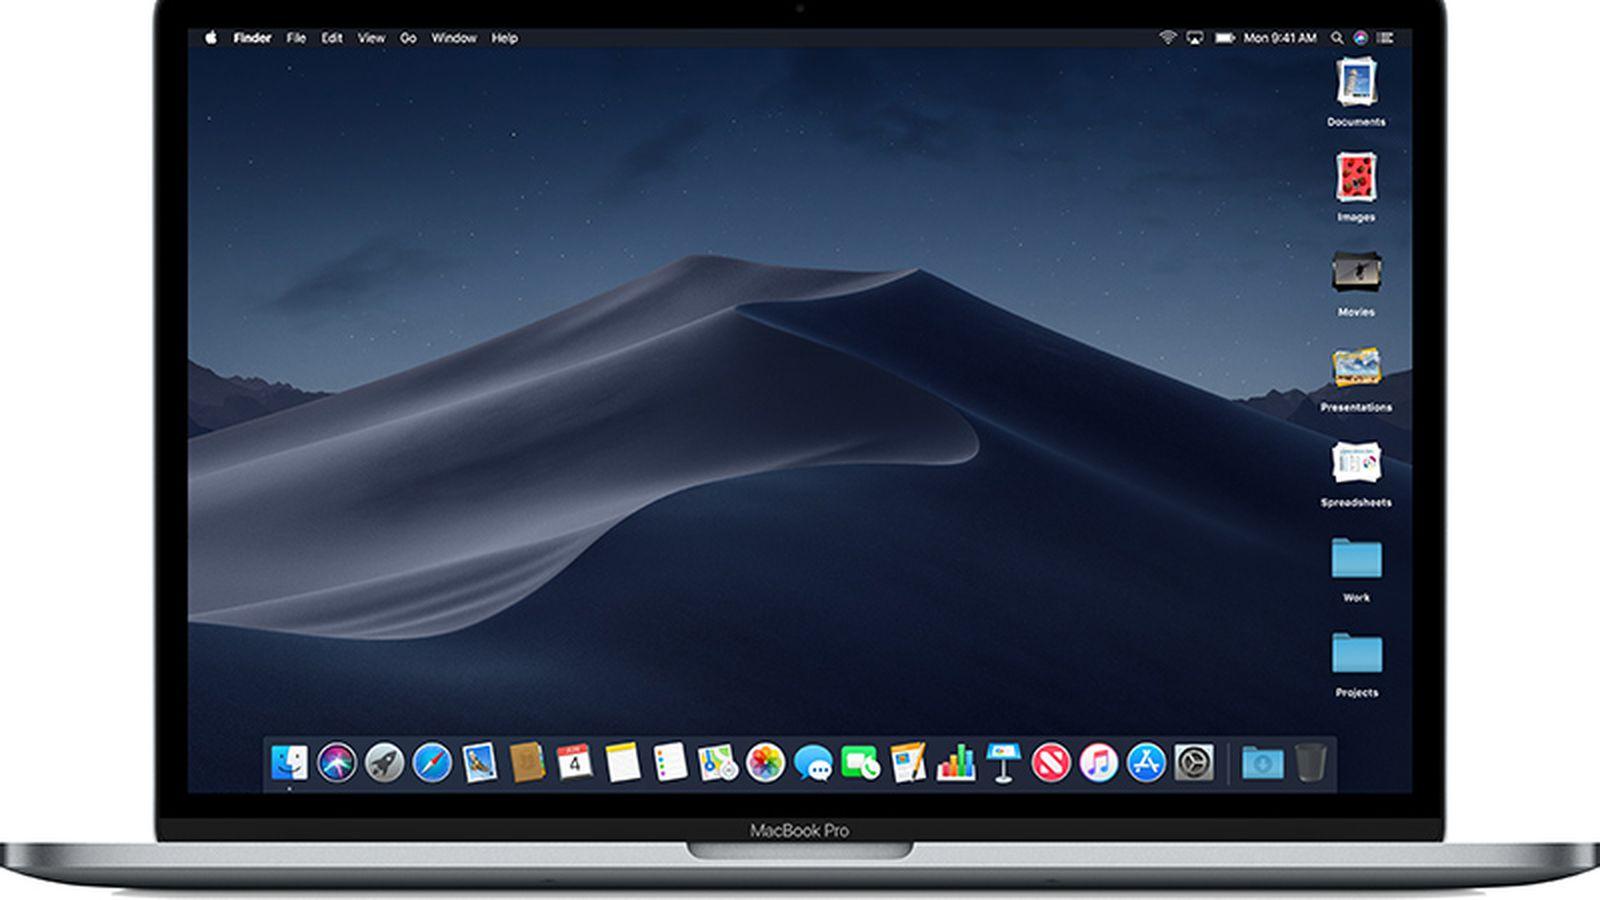 Macbook Pro Latest Software